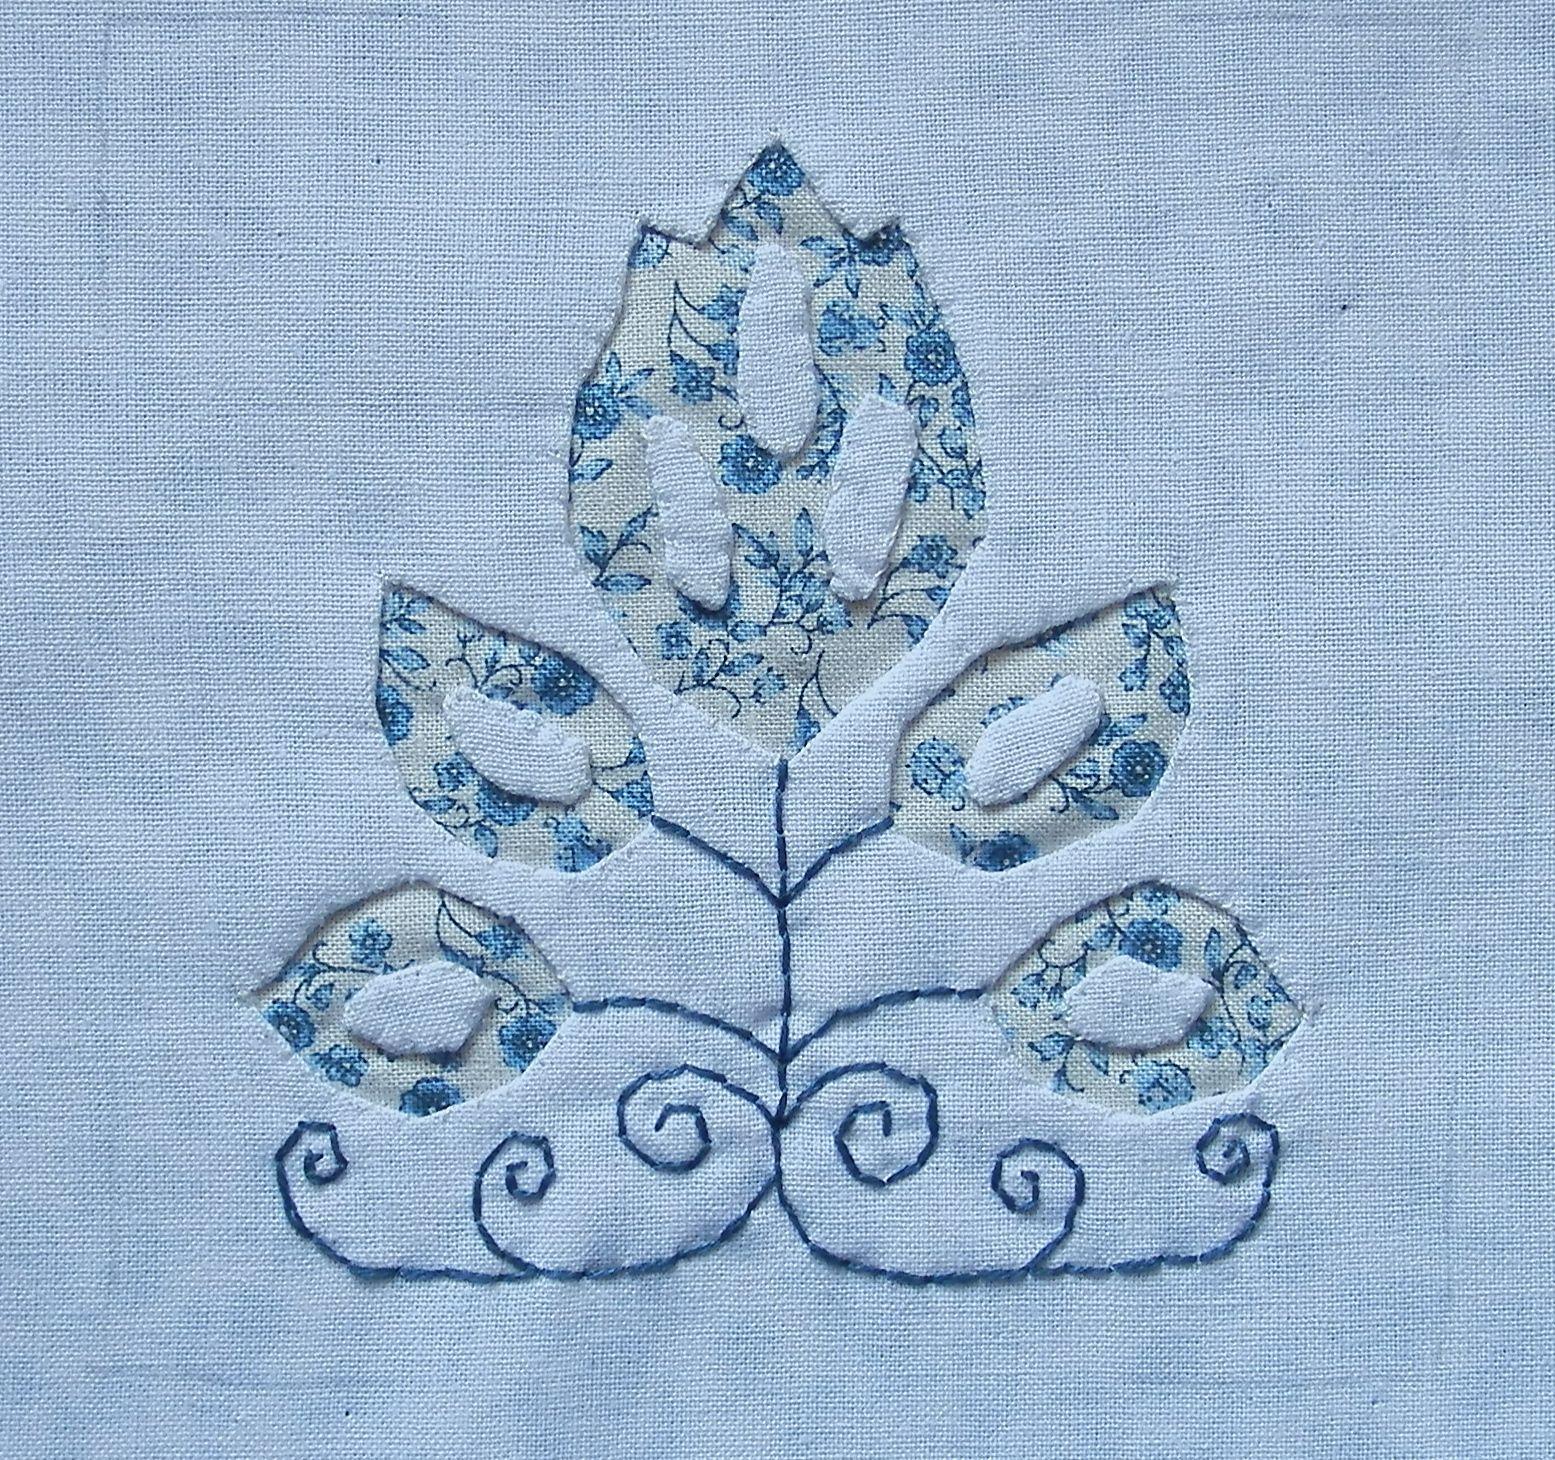 Wrought Iron - Dutch Treat Quilt by Brodeuse Bressane | Quilts ... : dutch treat quilt - Adamdwight.com